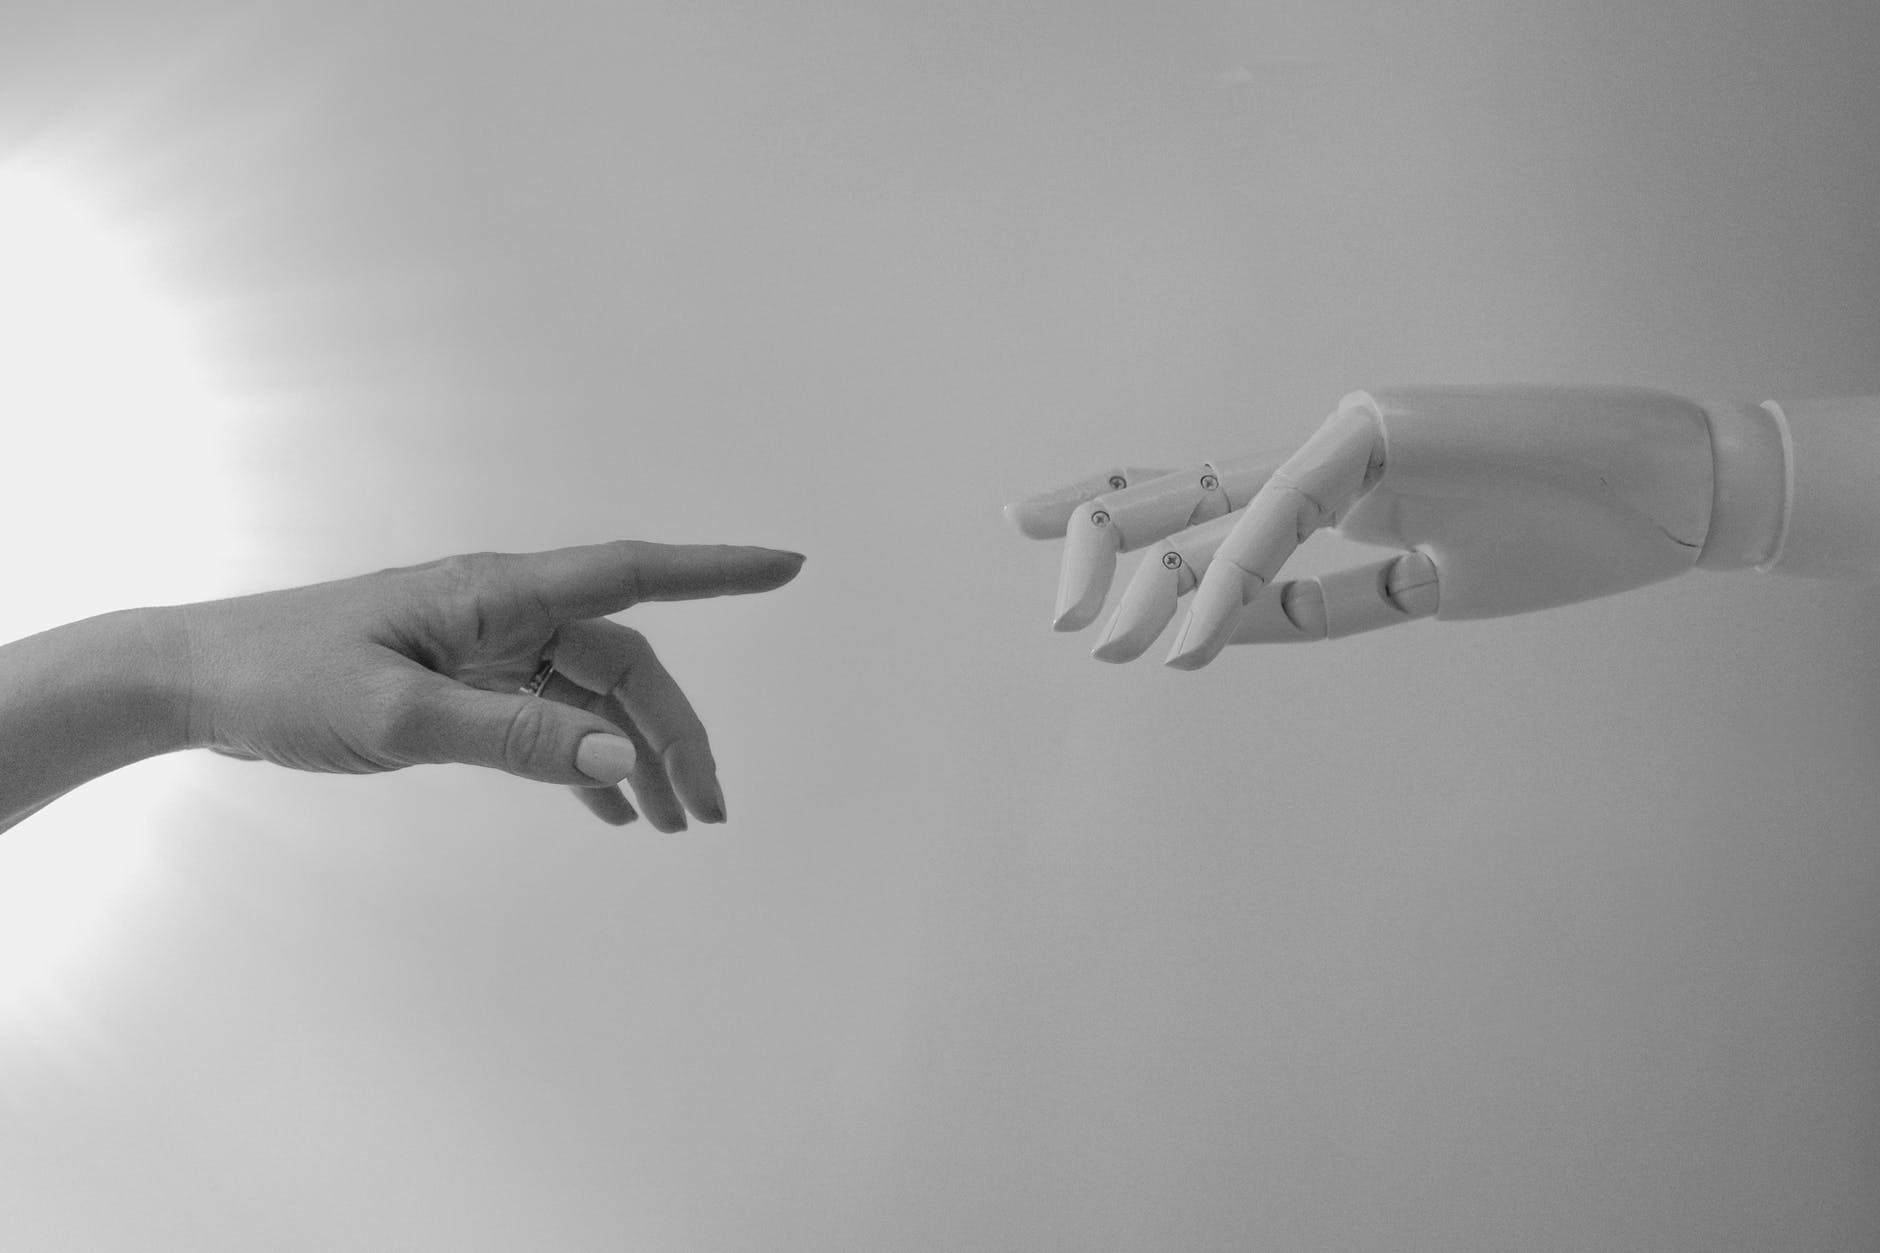 Mano robótica junto a mano humana